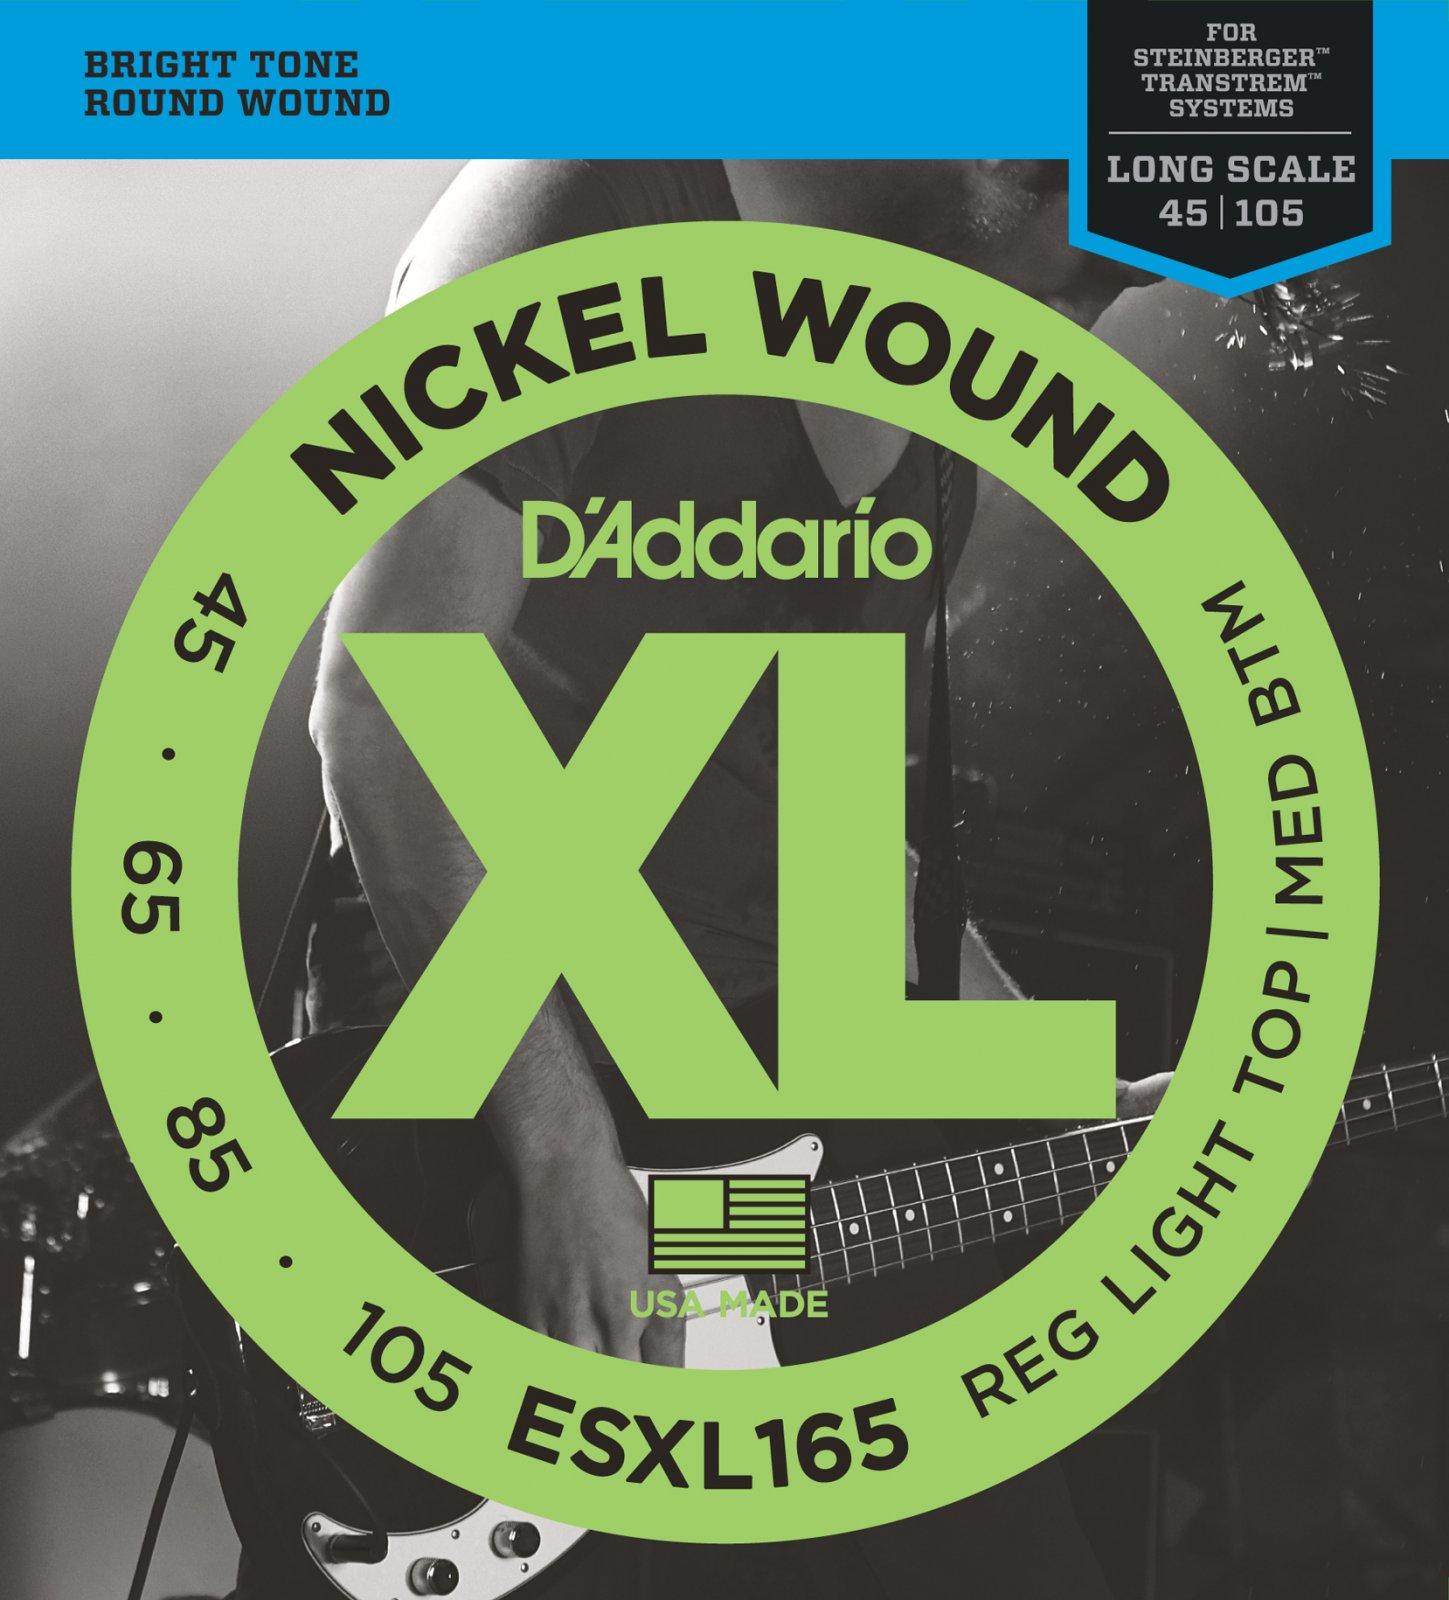 D'Addario ESXL165 Nickel Wound Bass Strings - Custom Light, 45-105, Double Ball End, Long Scale